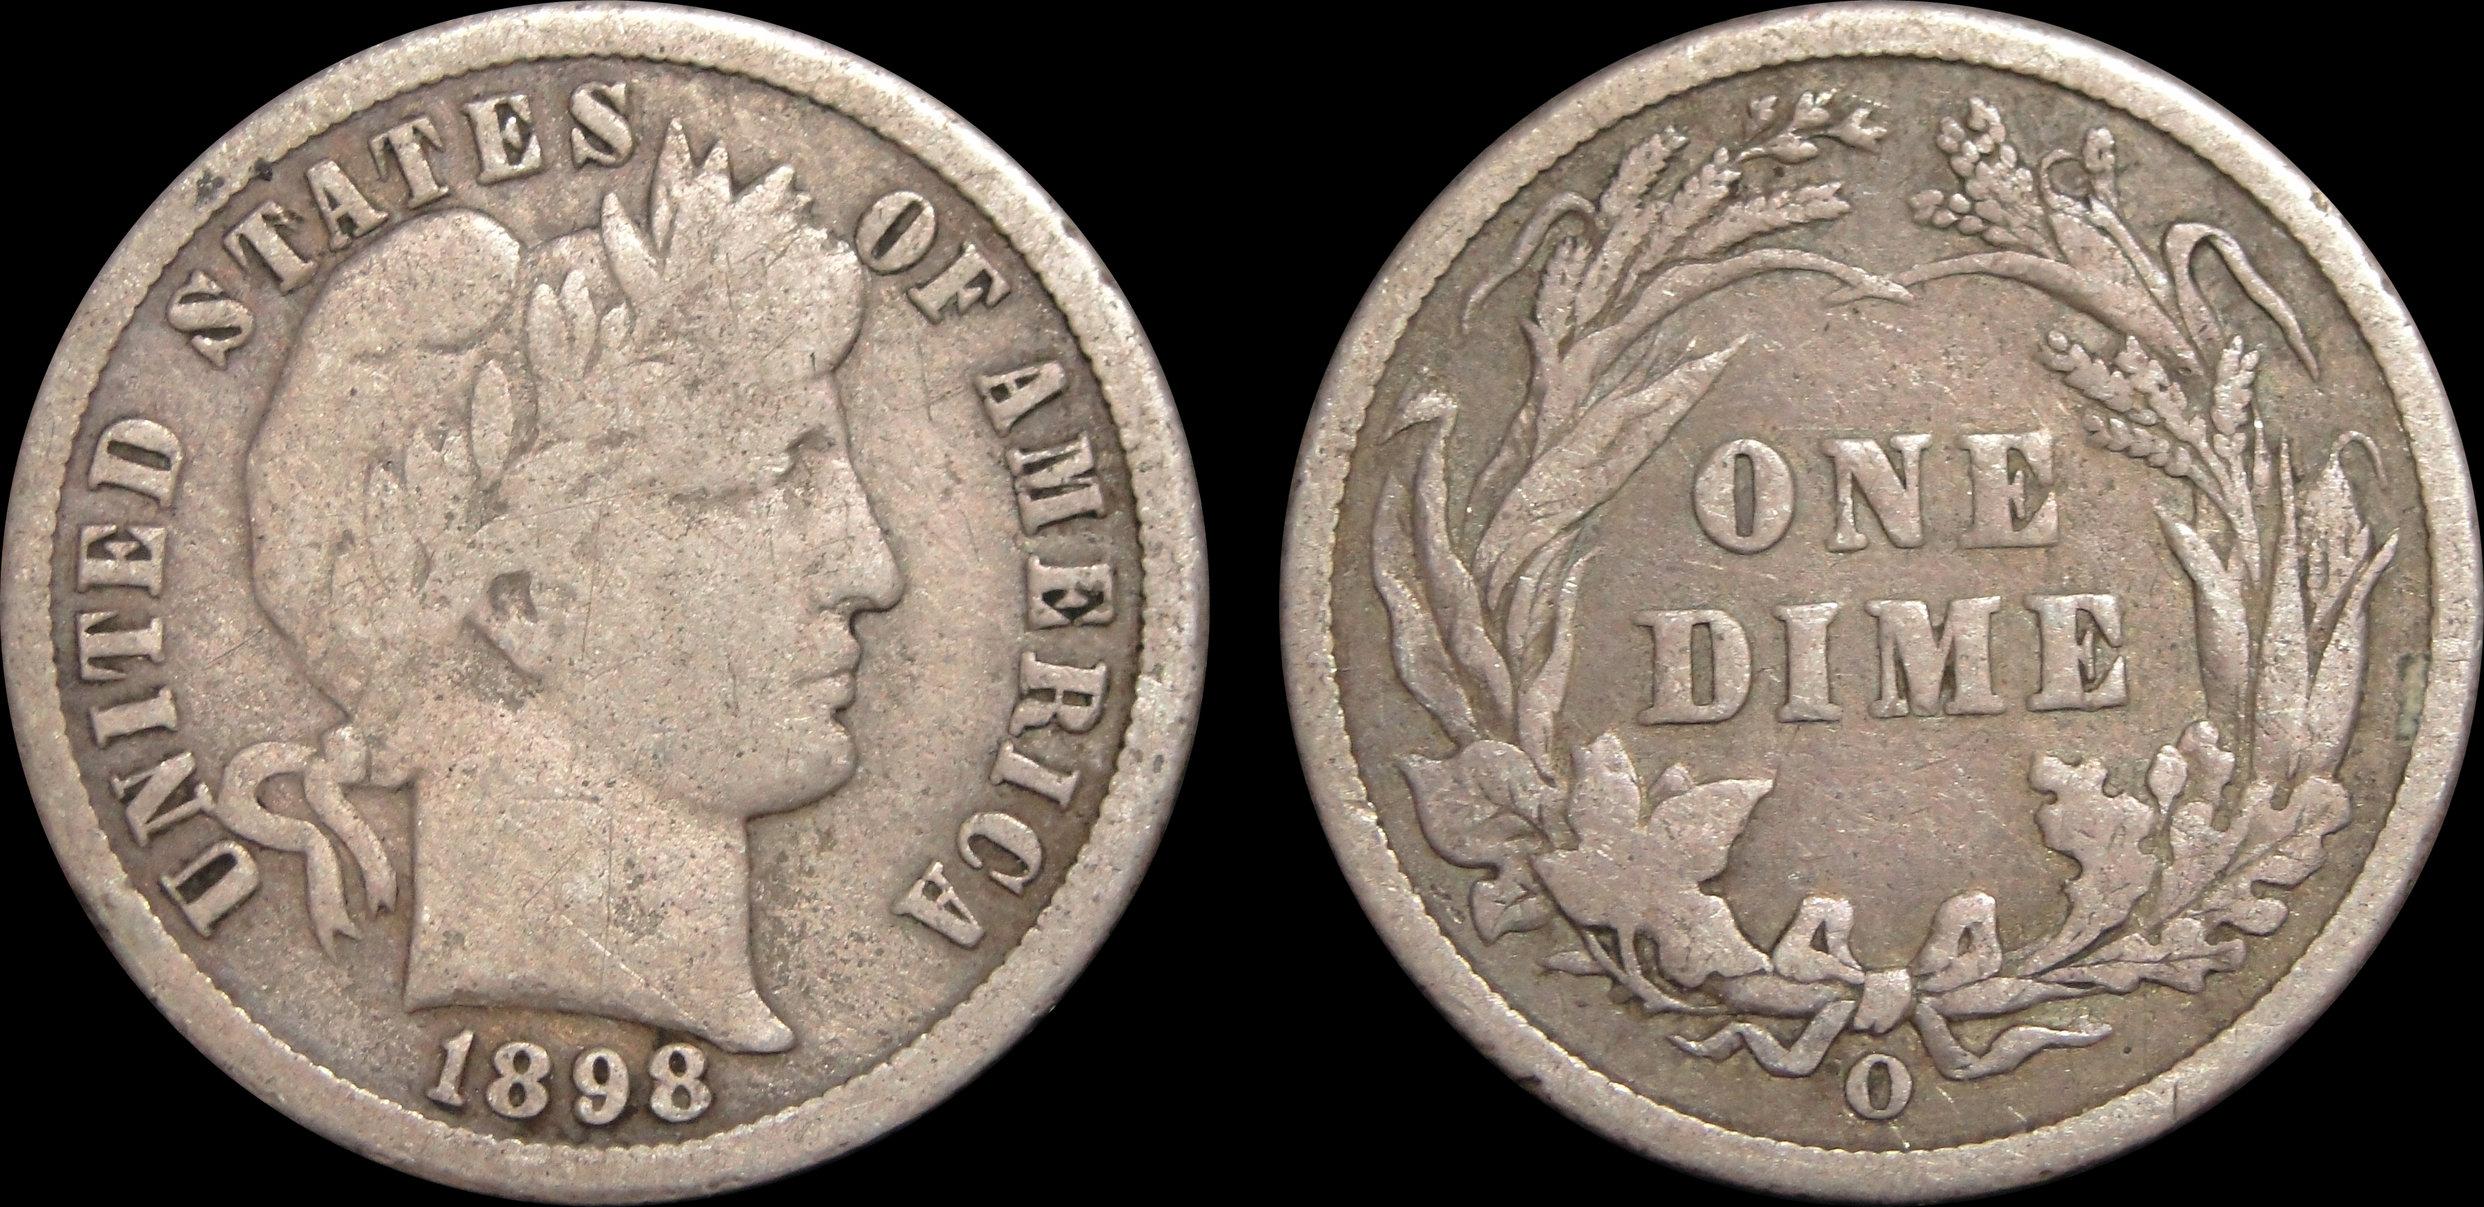 Voise Coin Listing Date Hrb Coin Bill Receipt